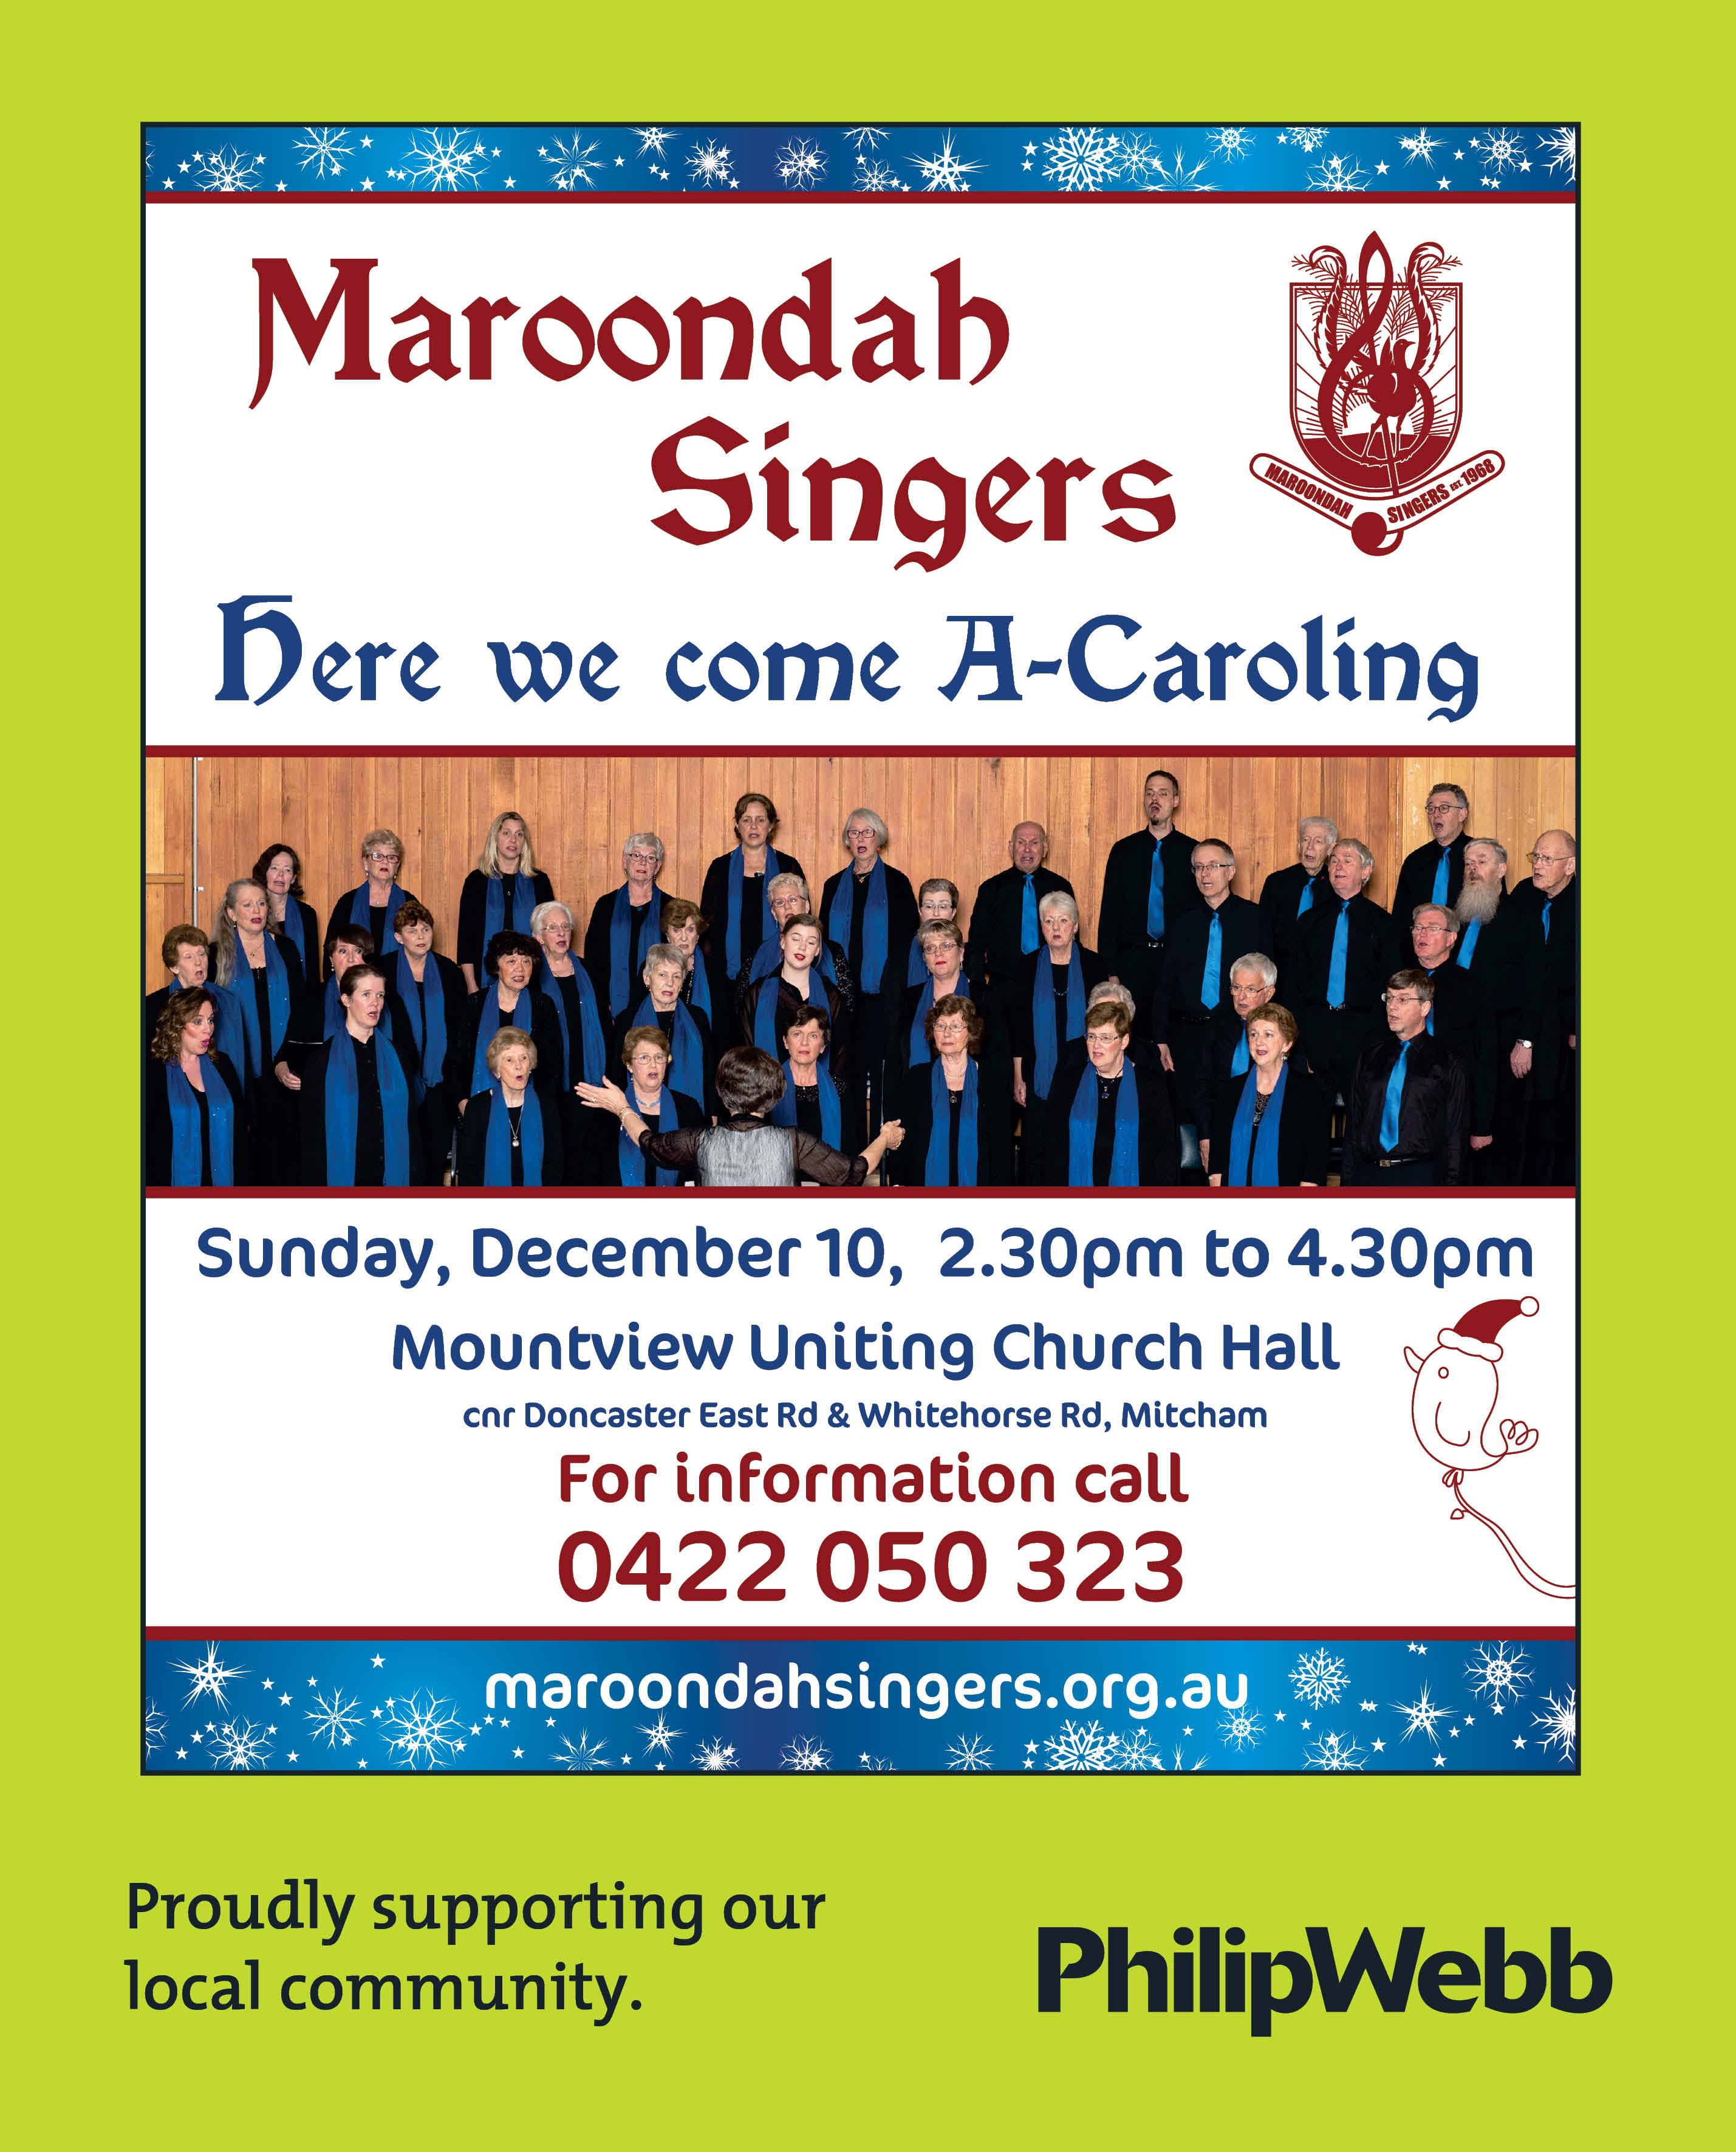 Maroondah Singers - Here We Come A-Caroling